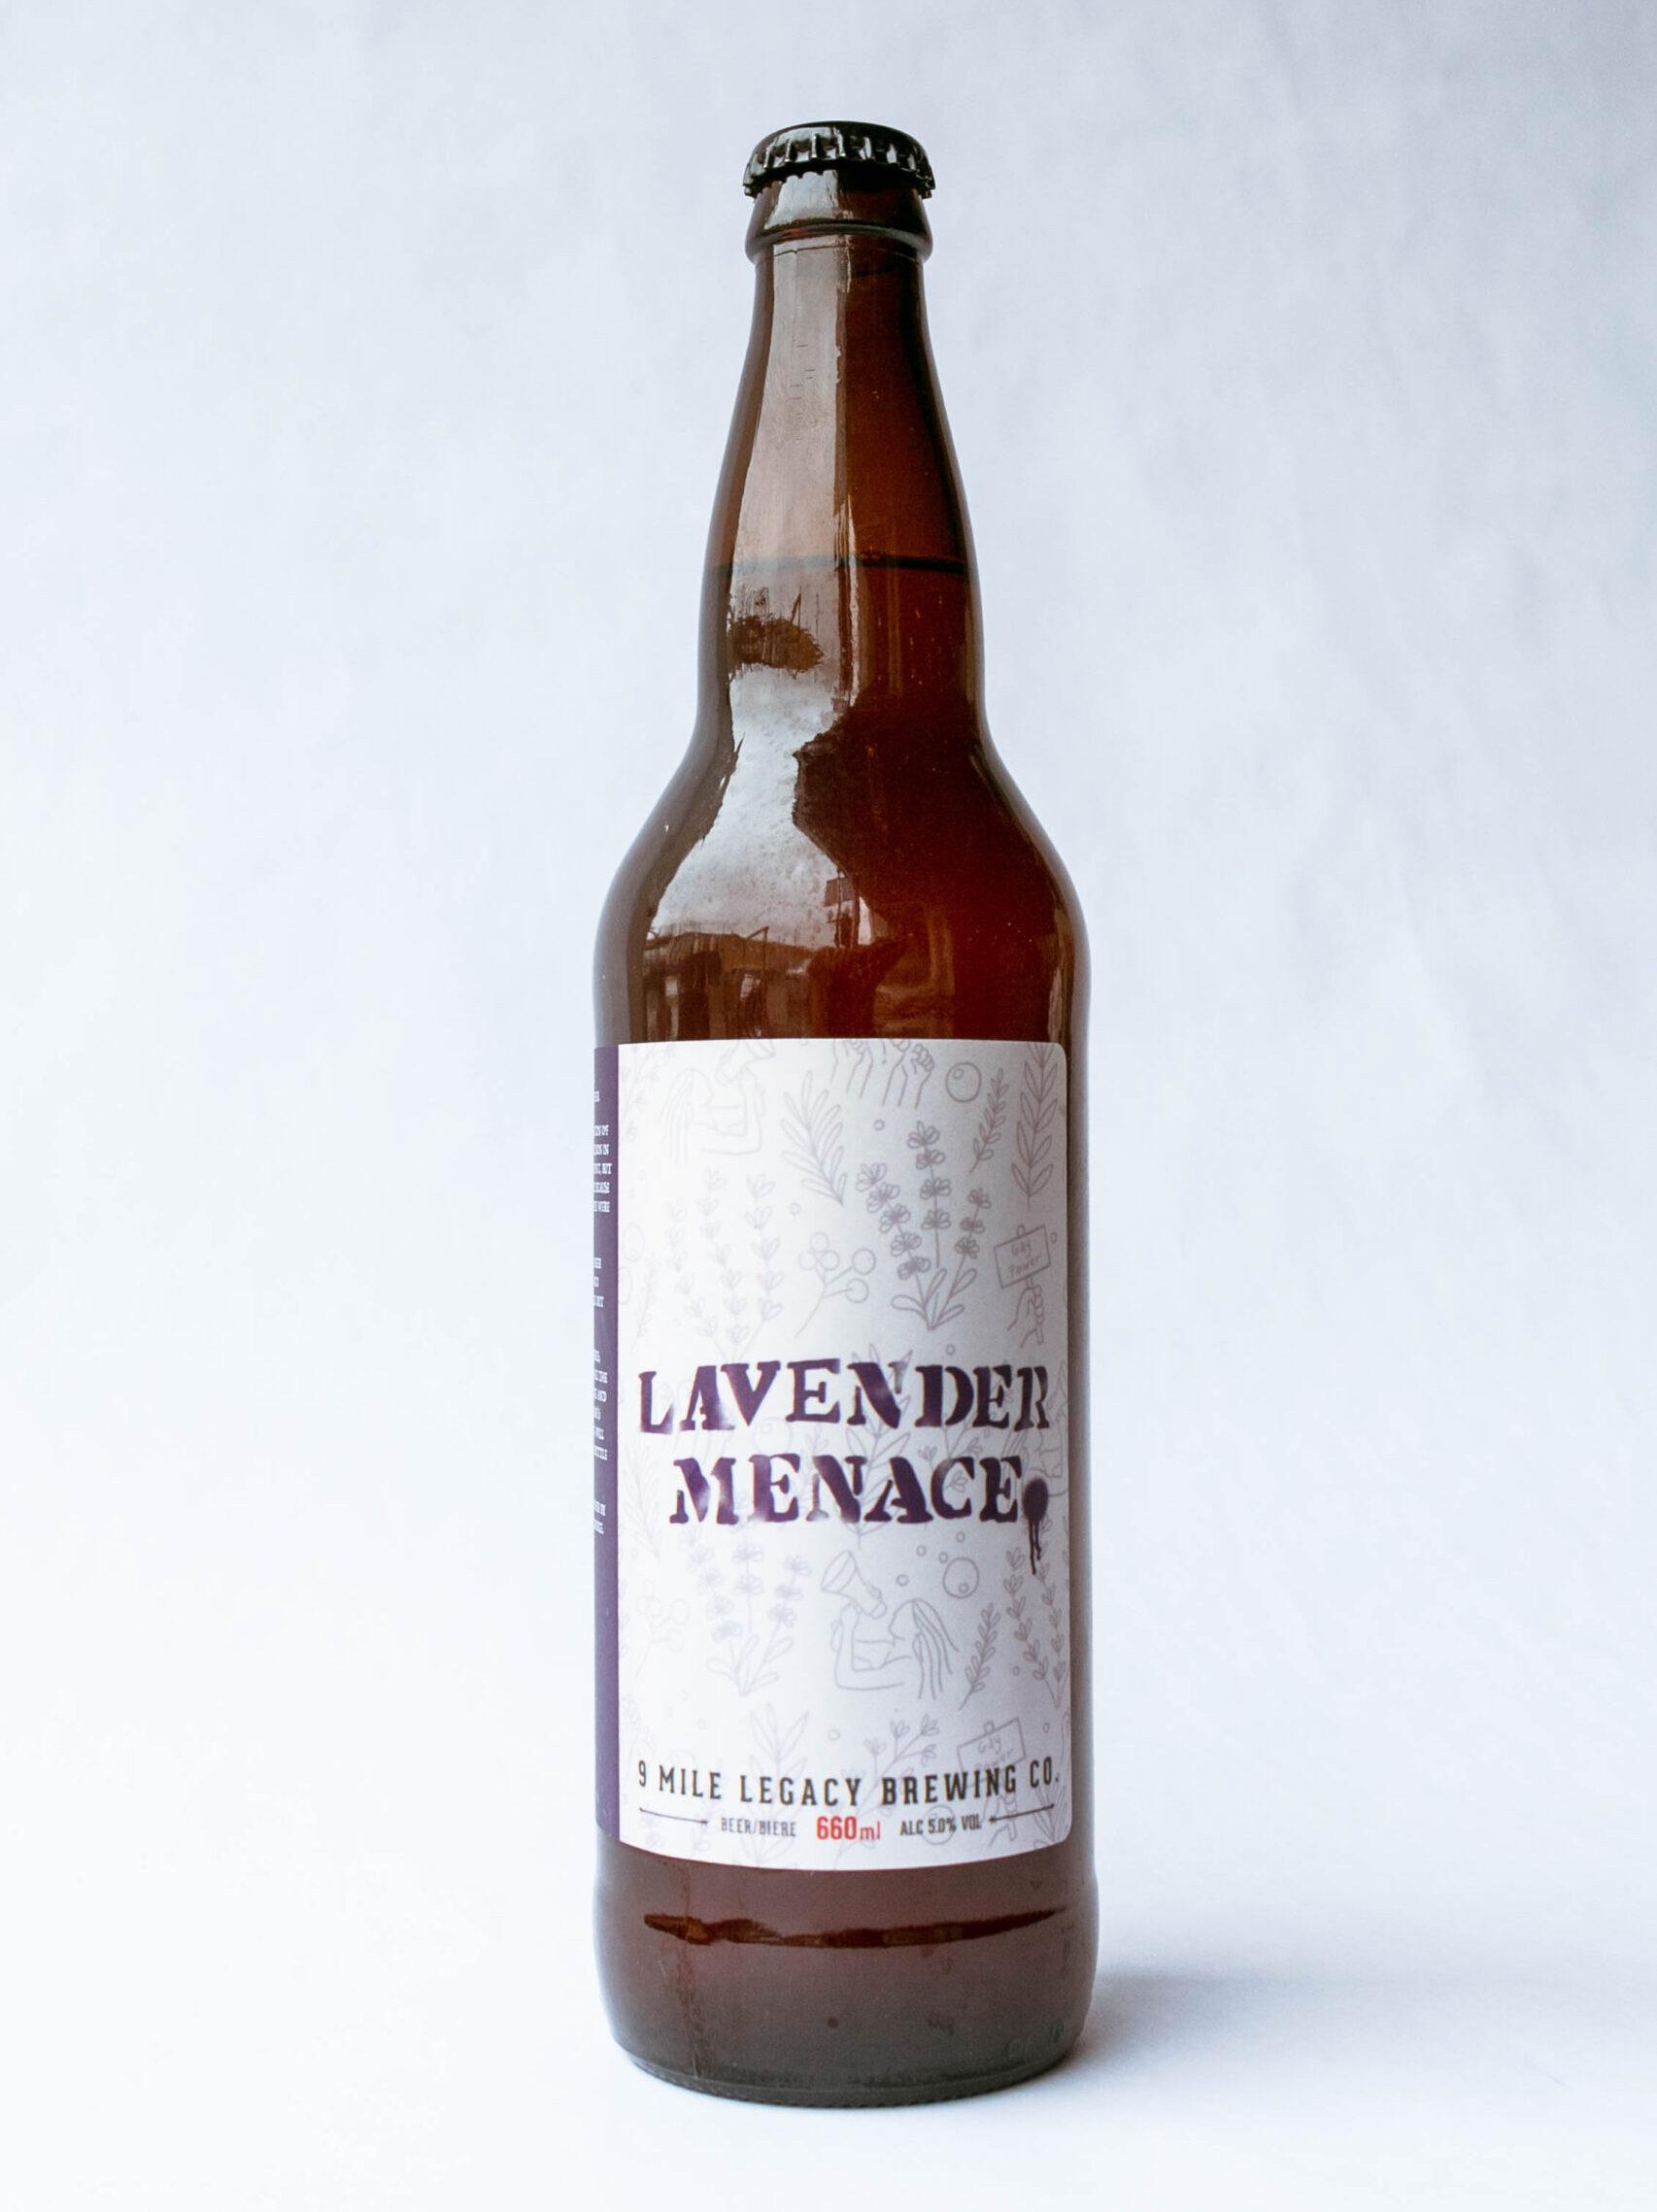 Lavender Menace